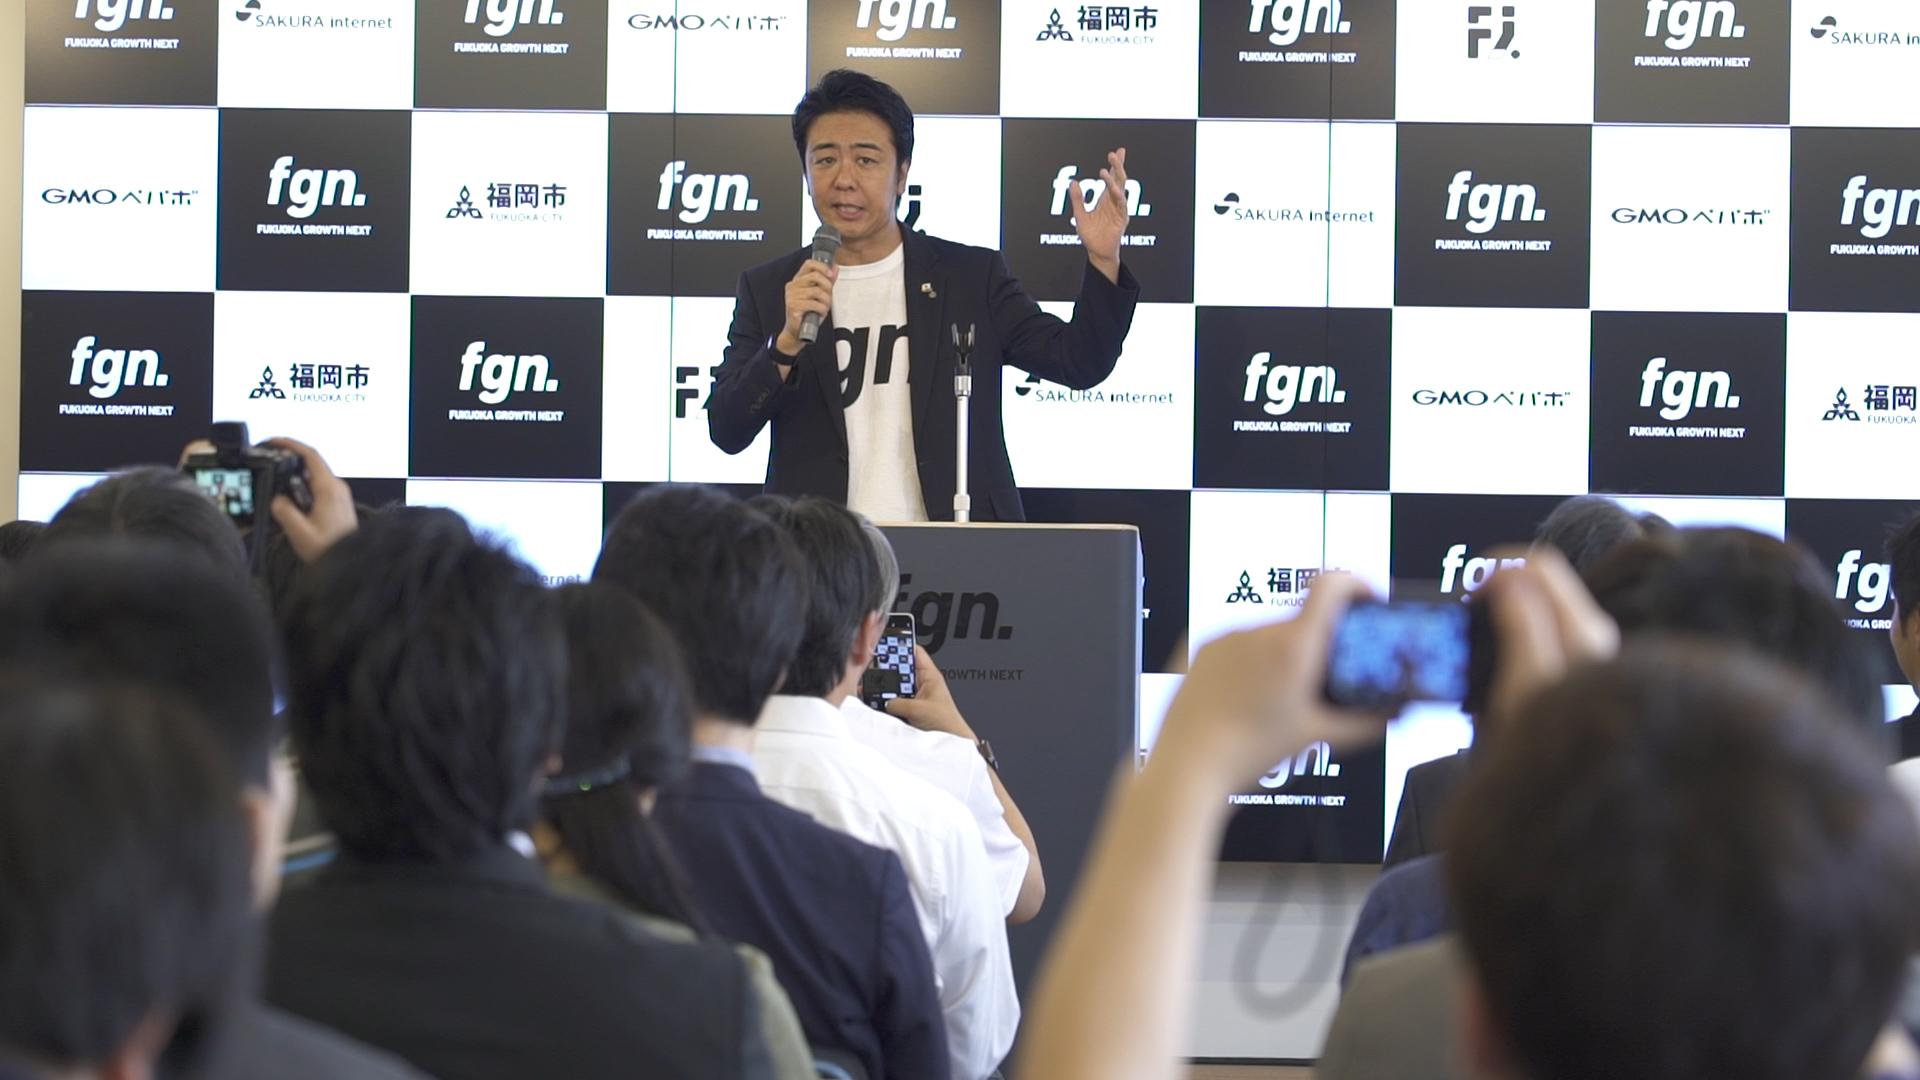 「Fukuoka growth next」がリニューアルオープン